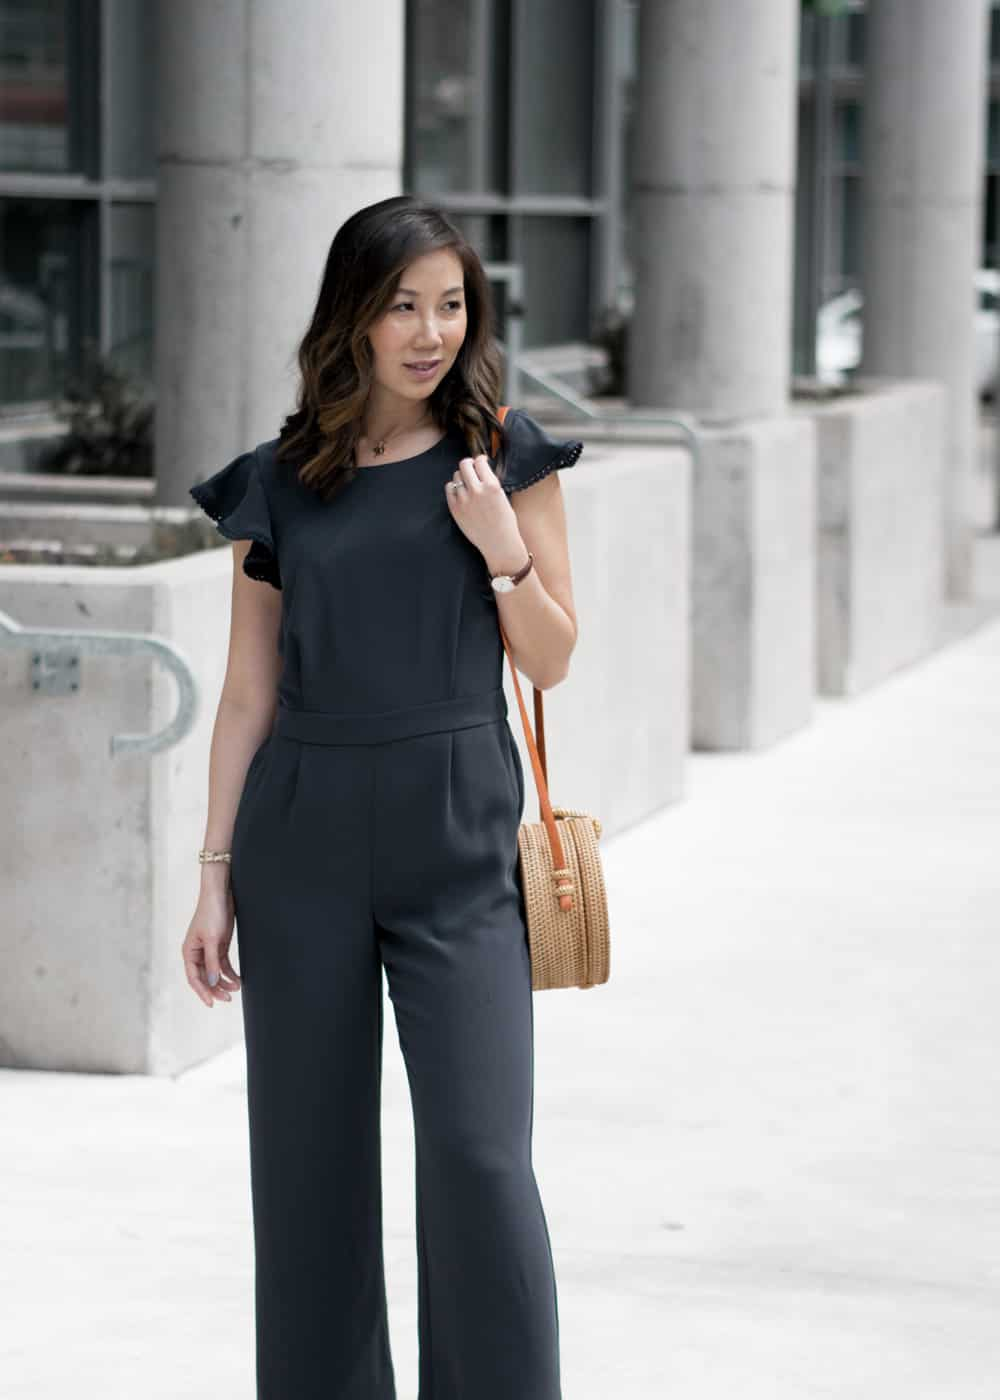 bf57c2524da Toronto-fashion-blogger -yesmissy-AnnTaylor-collaboration-rattan-round-bag-navy-jumpsuit-strappy-sandals